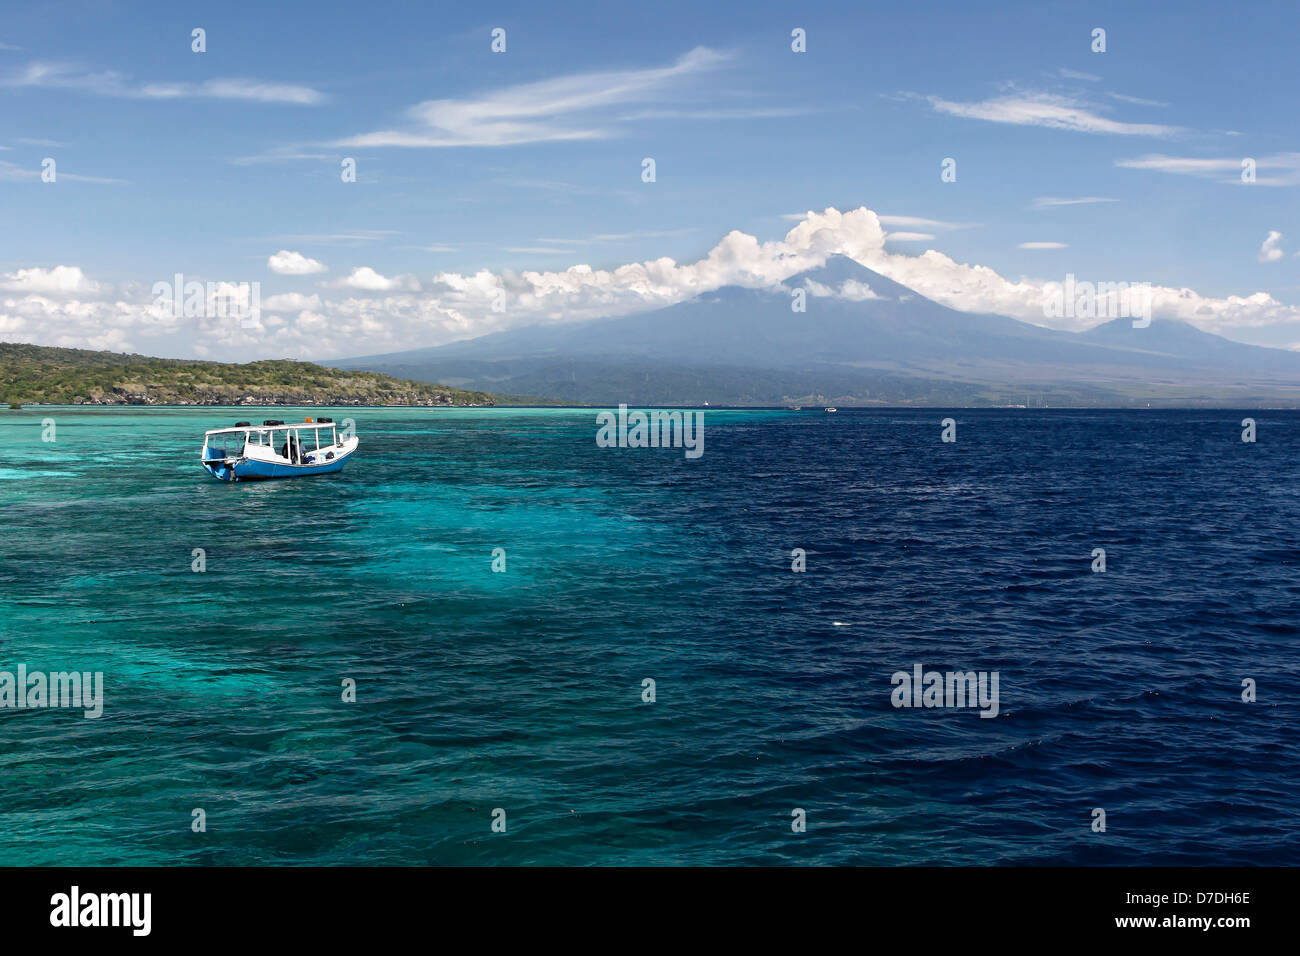 Boat at Coast, Bali, Indonesien - Stock Image